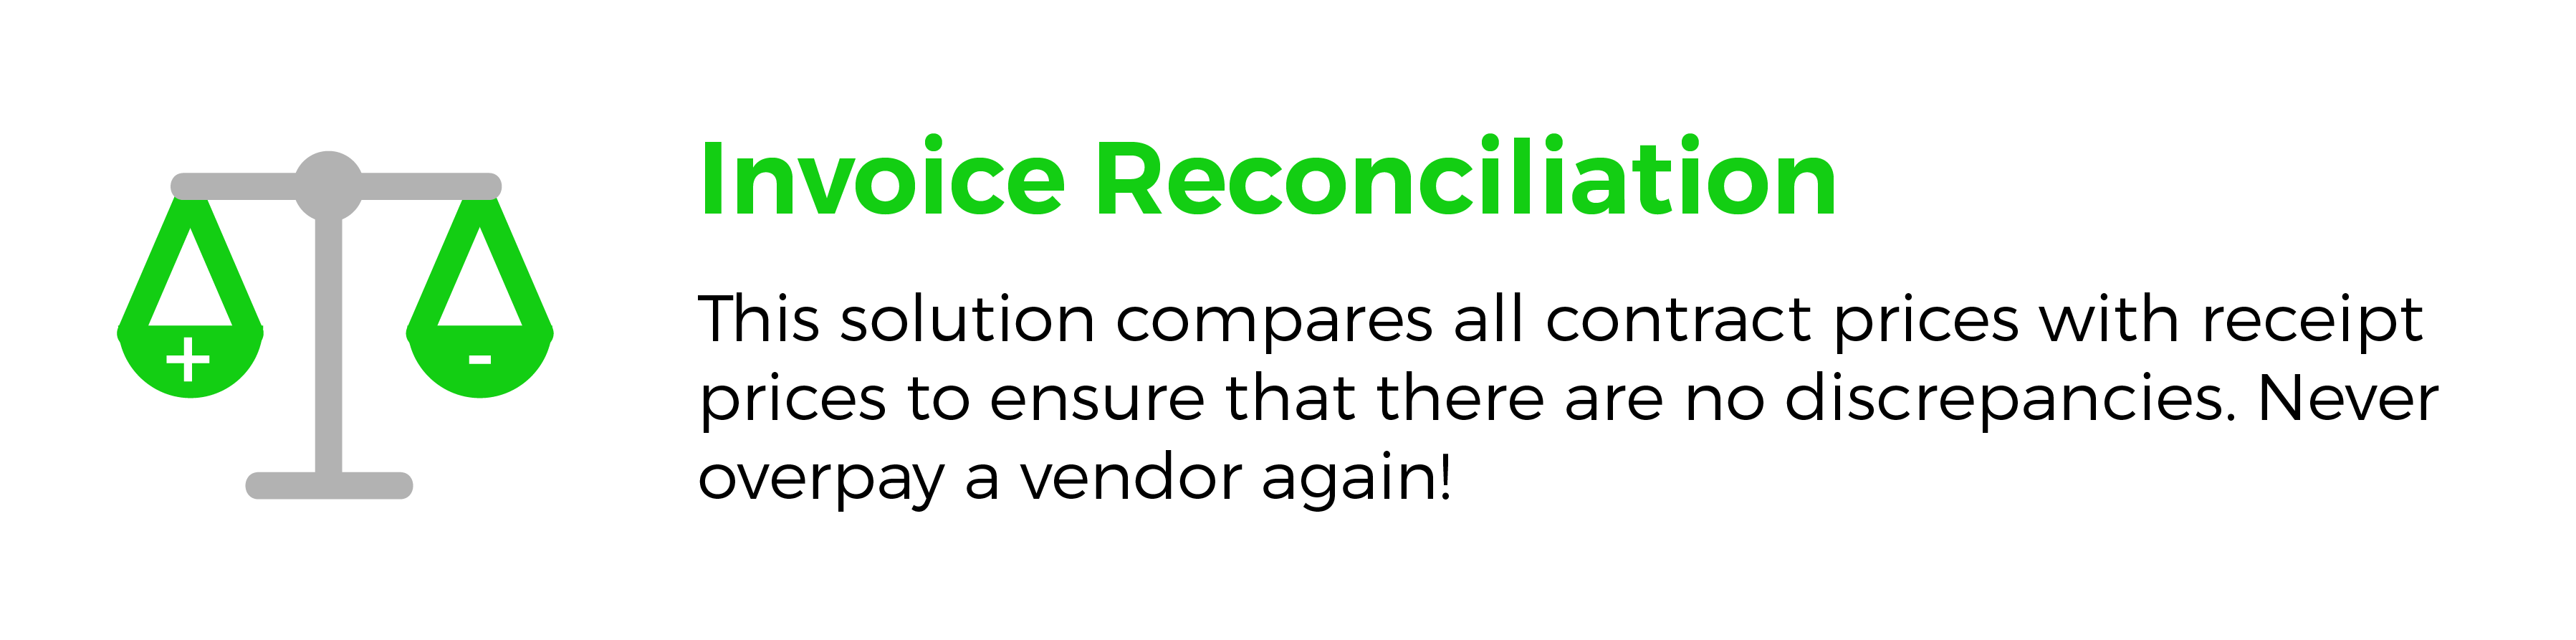 Invoice Reconciliation-01